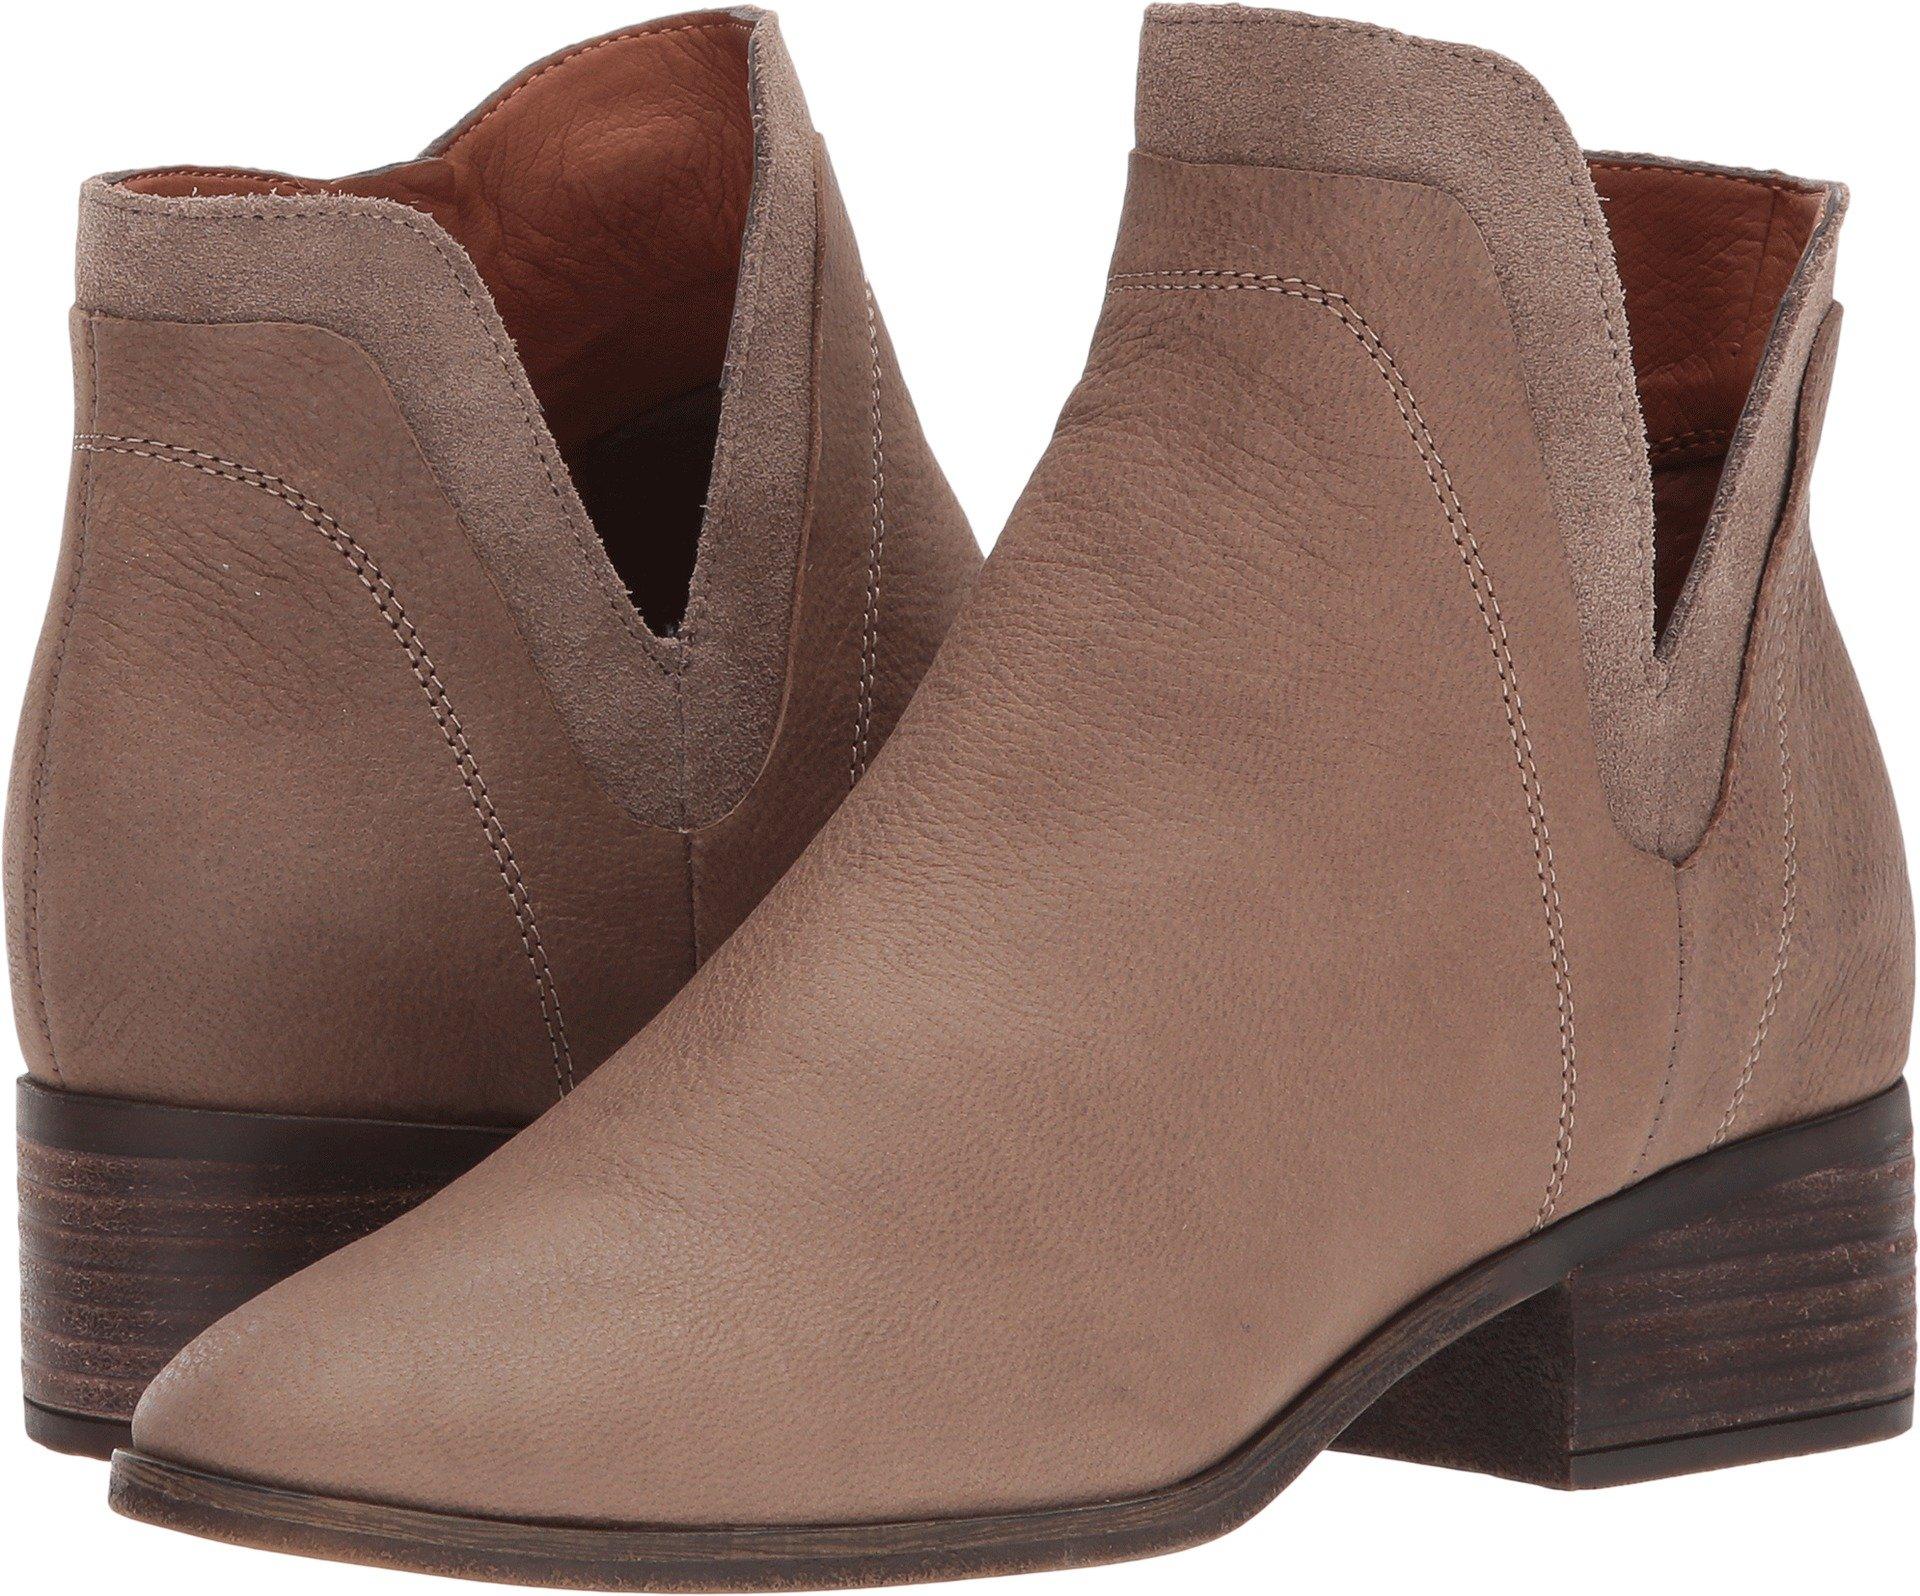 Lucky Brand Women's Lelah Ankle Boot, Brindle, 9 Medium US